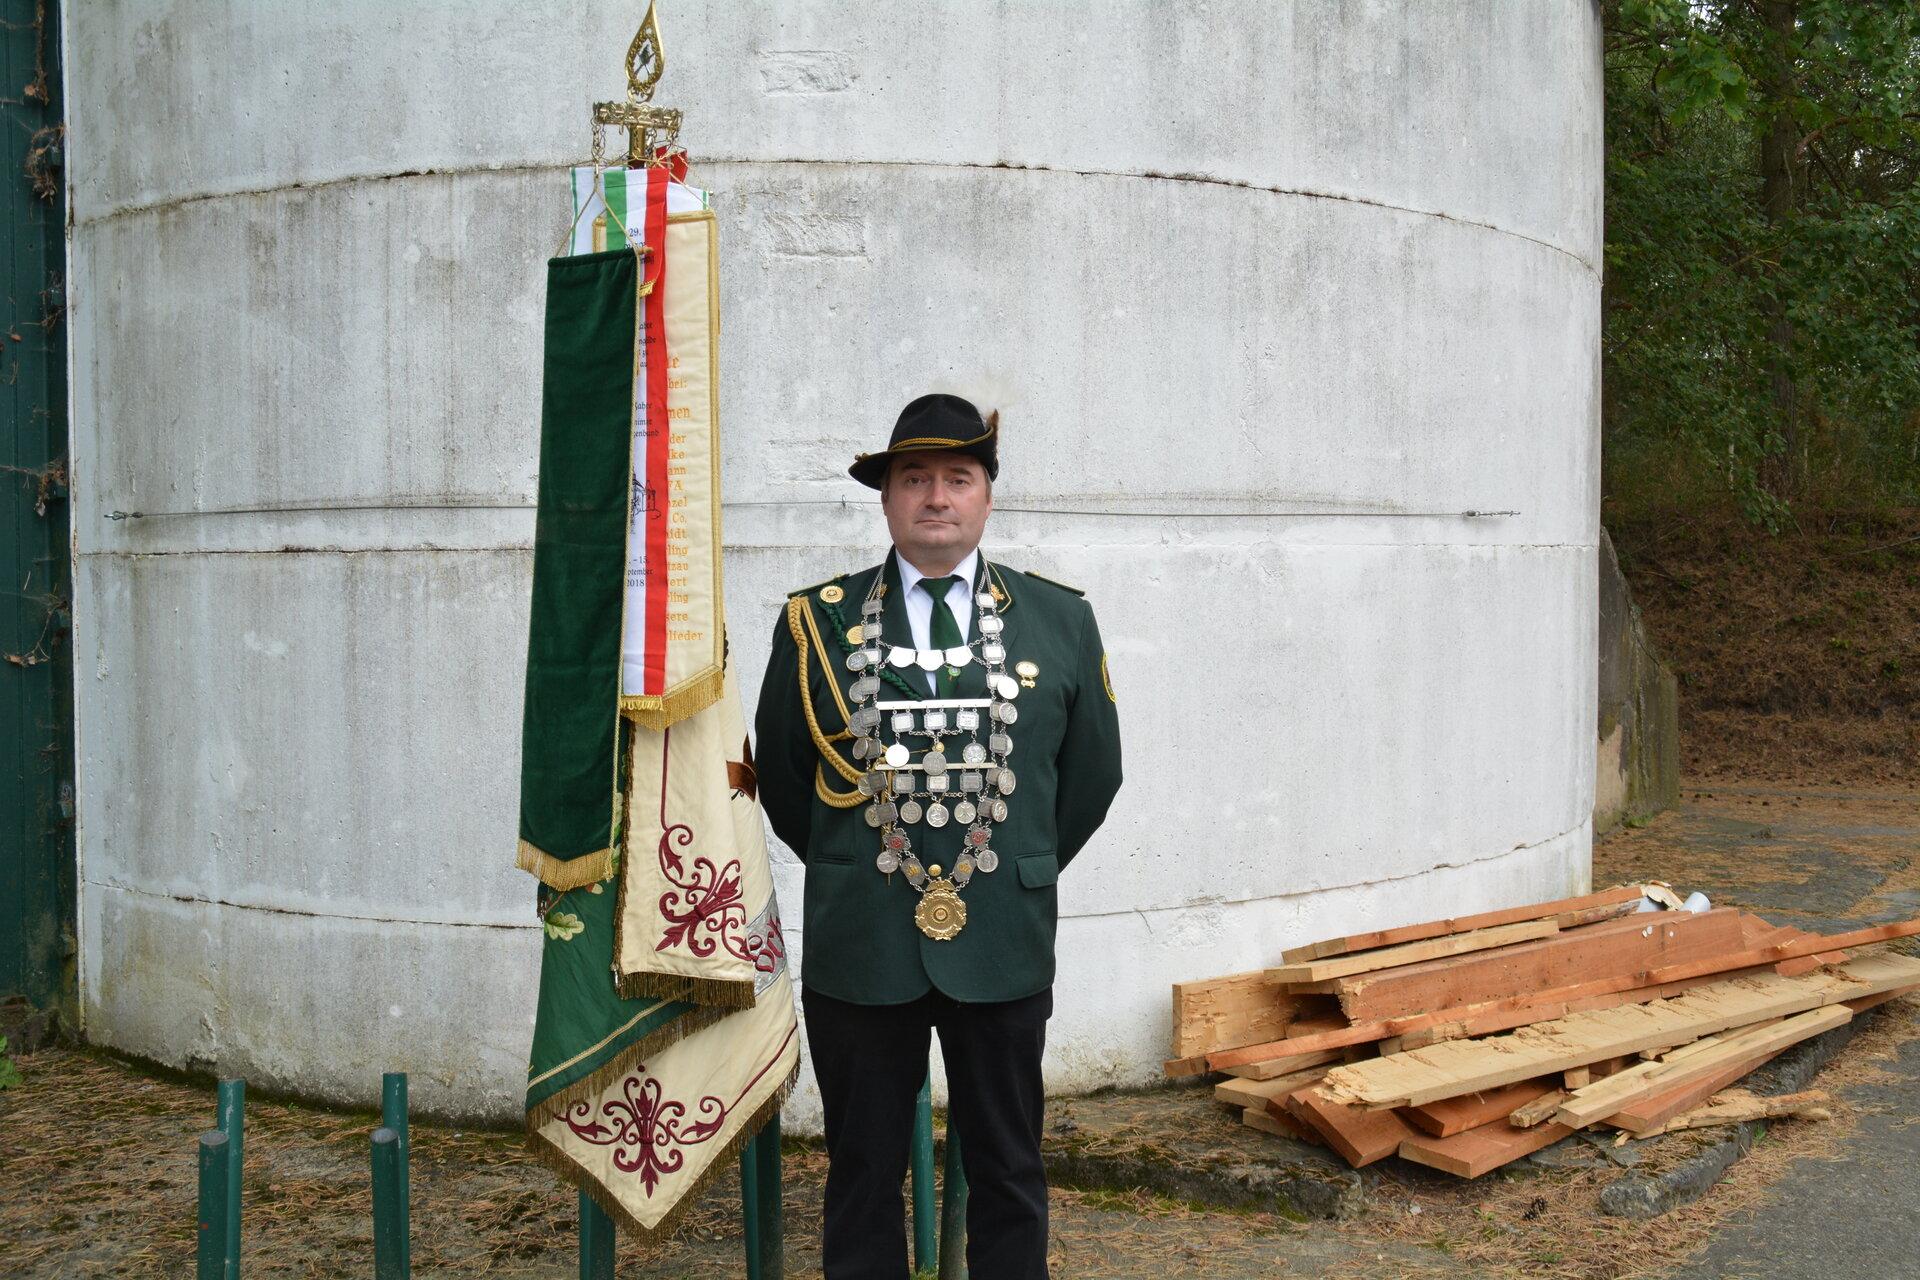 Schützenkönig 2020